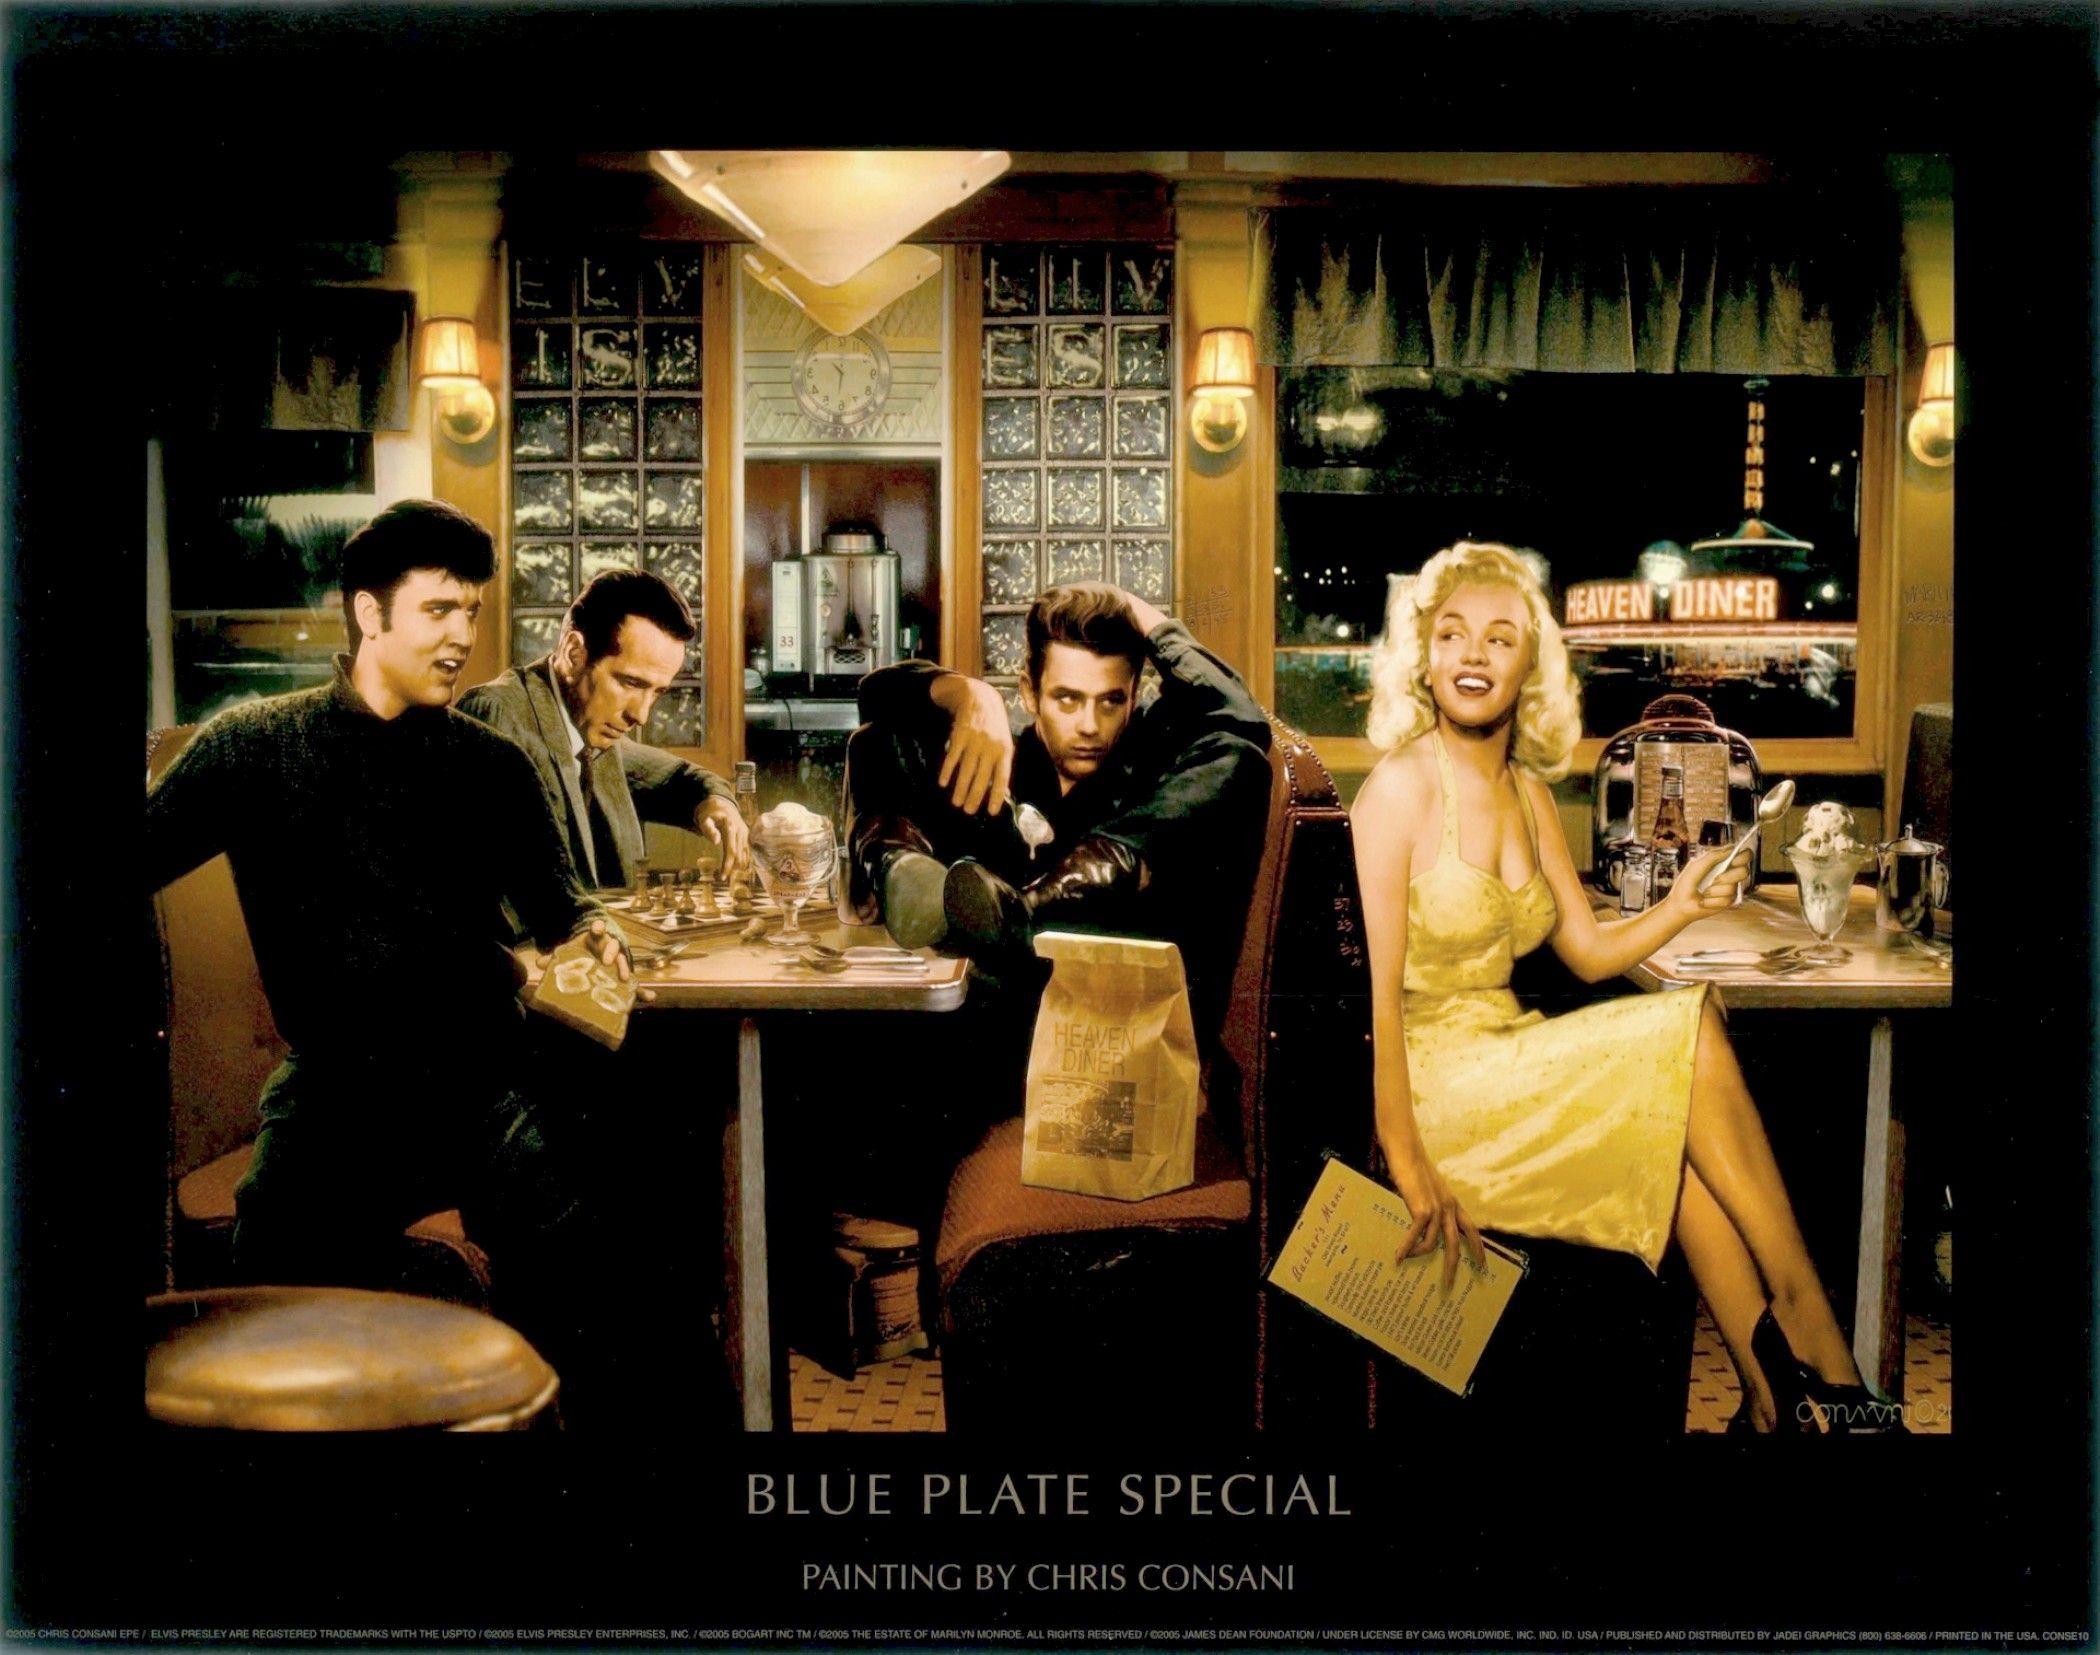 James Dean,Marilyn Monroe,Elvis Presley and Humphrey Bogart by Chris Consani